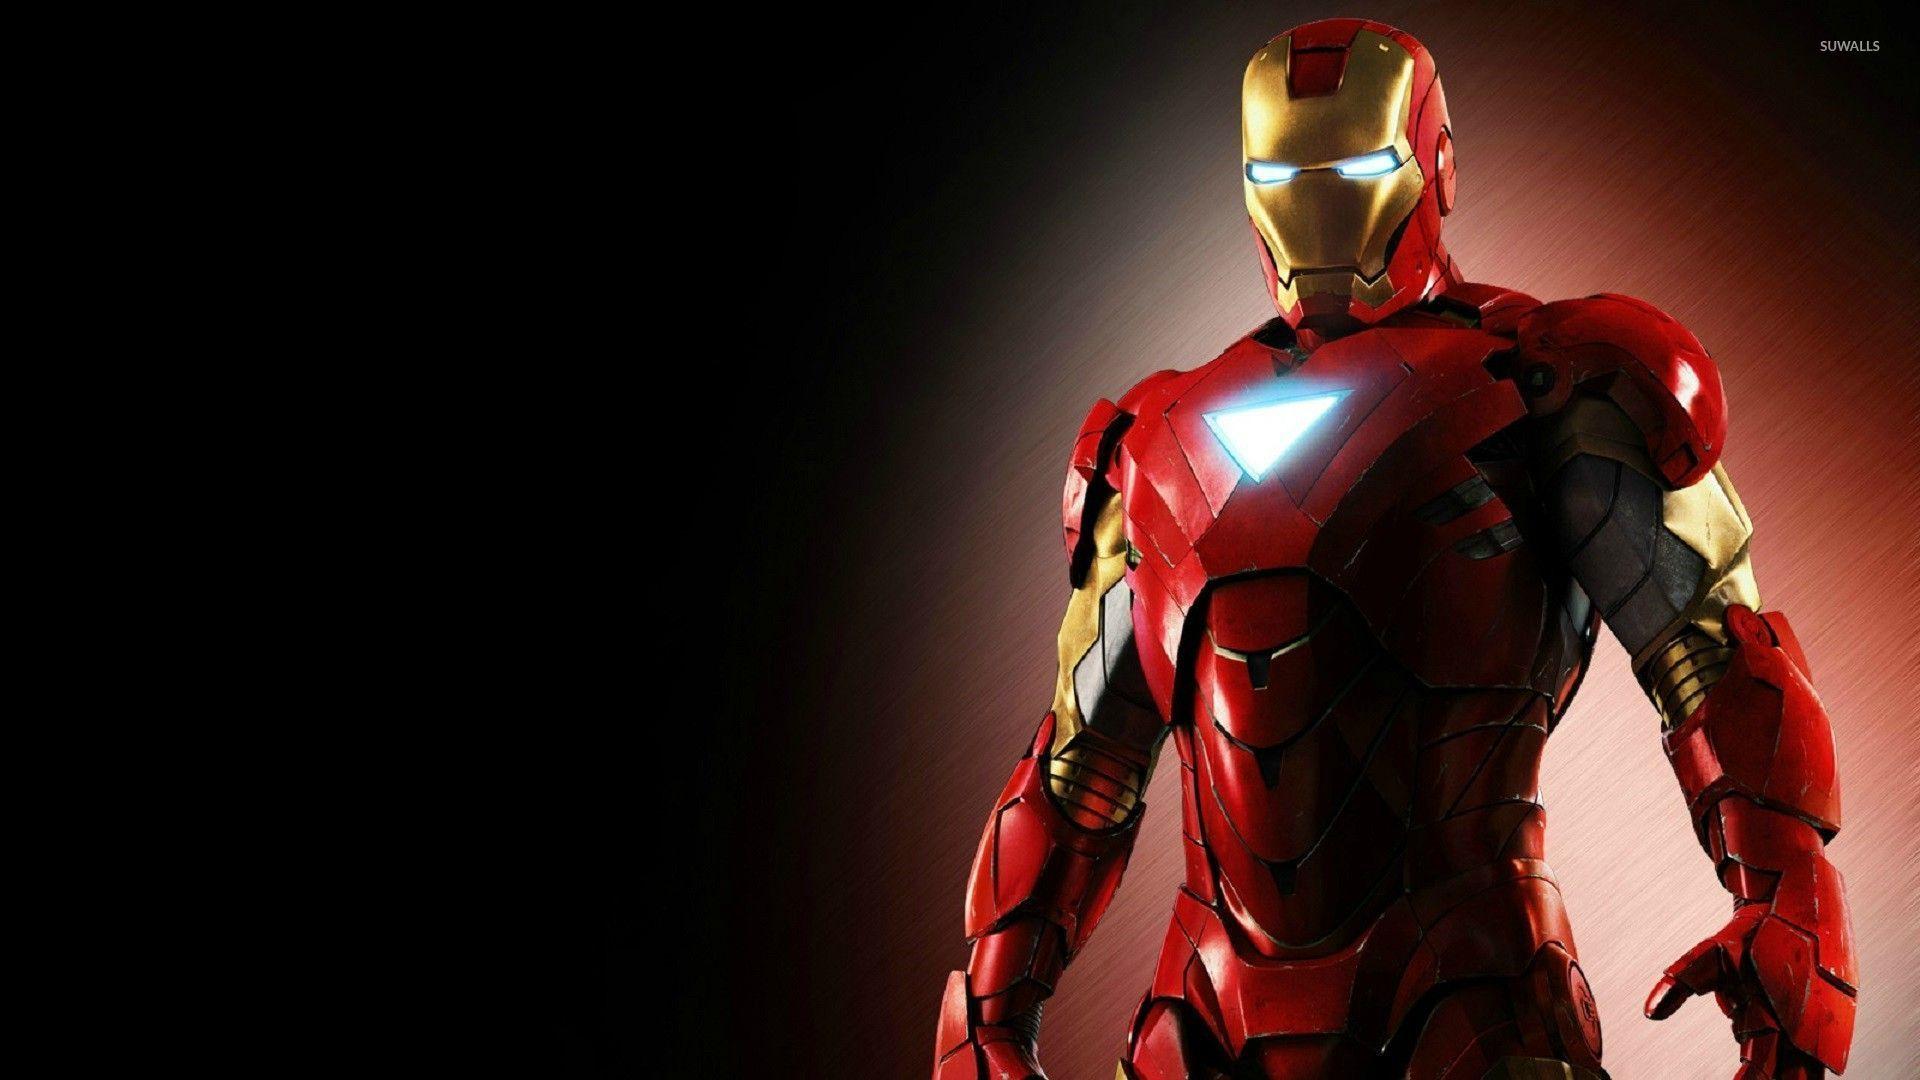 Iron Man Wallpaper For Computer Iron Man Wallpaper Iron Man Hd